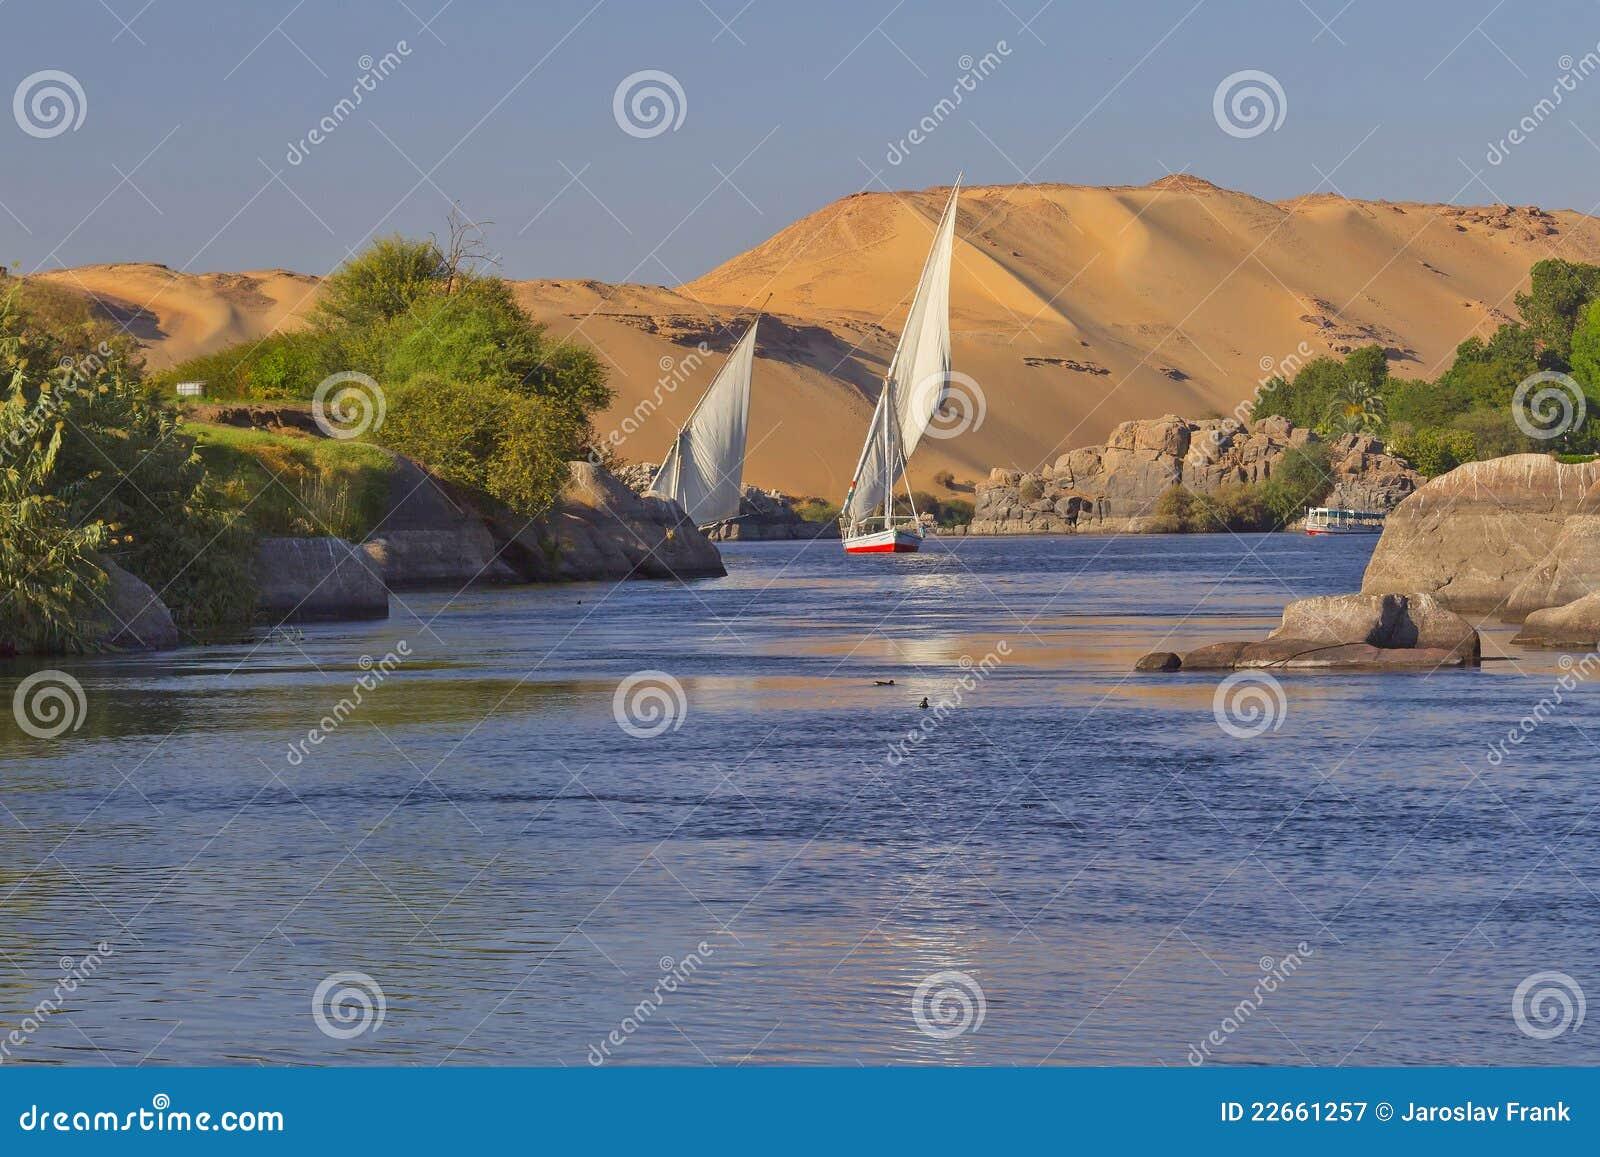 Sailing on the Nile. Gateway to Nubia ( Egypt)